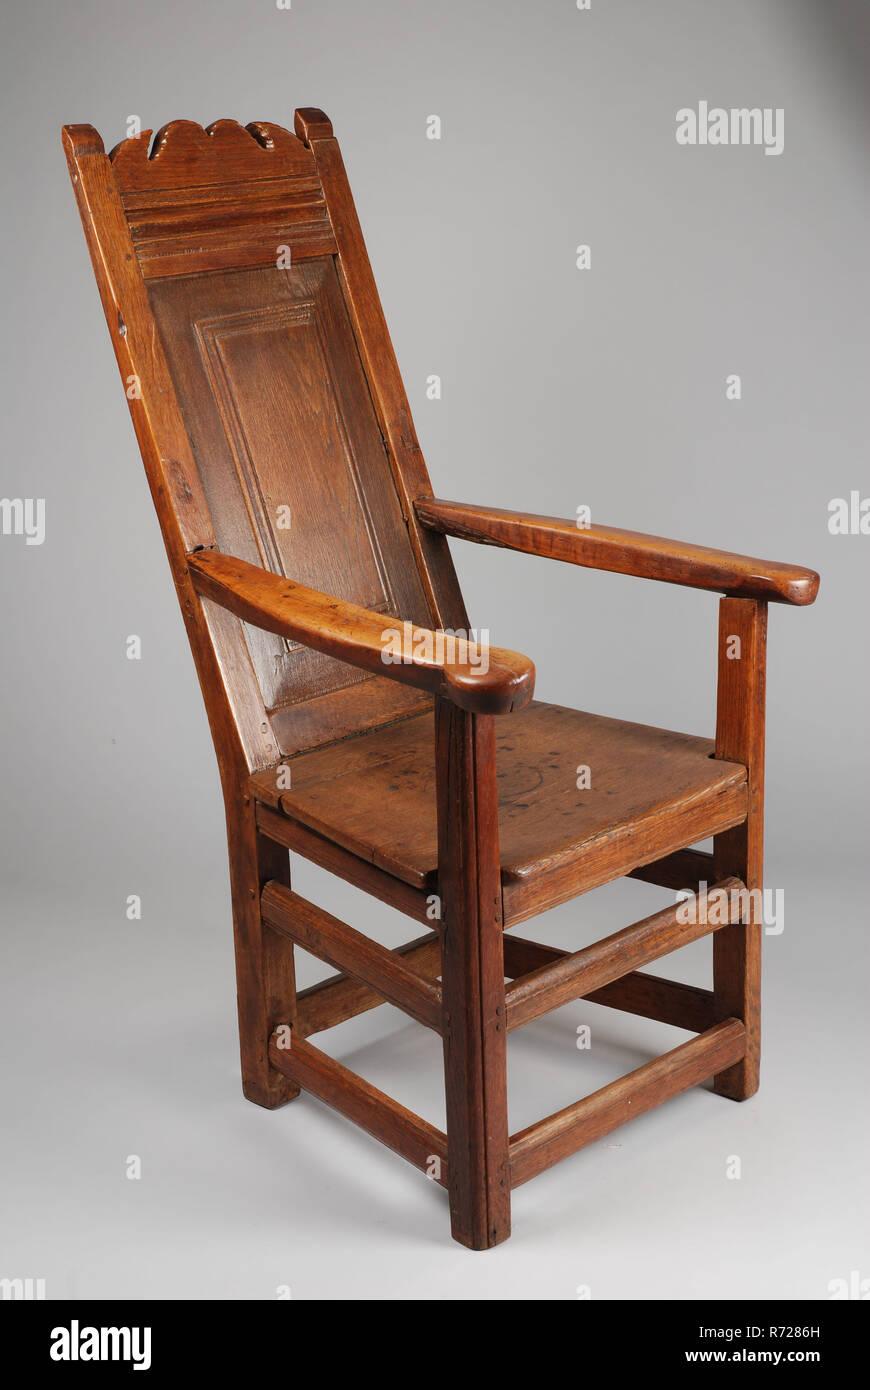 eiche stuhl stuhl mobel mobel interior design eiche holz birnbaum